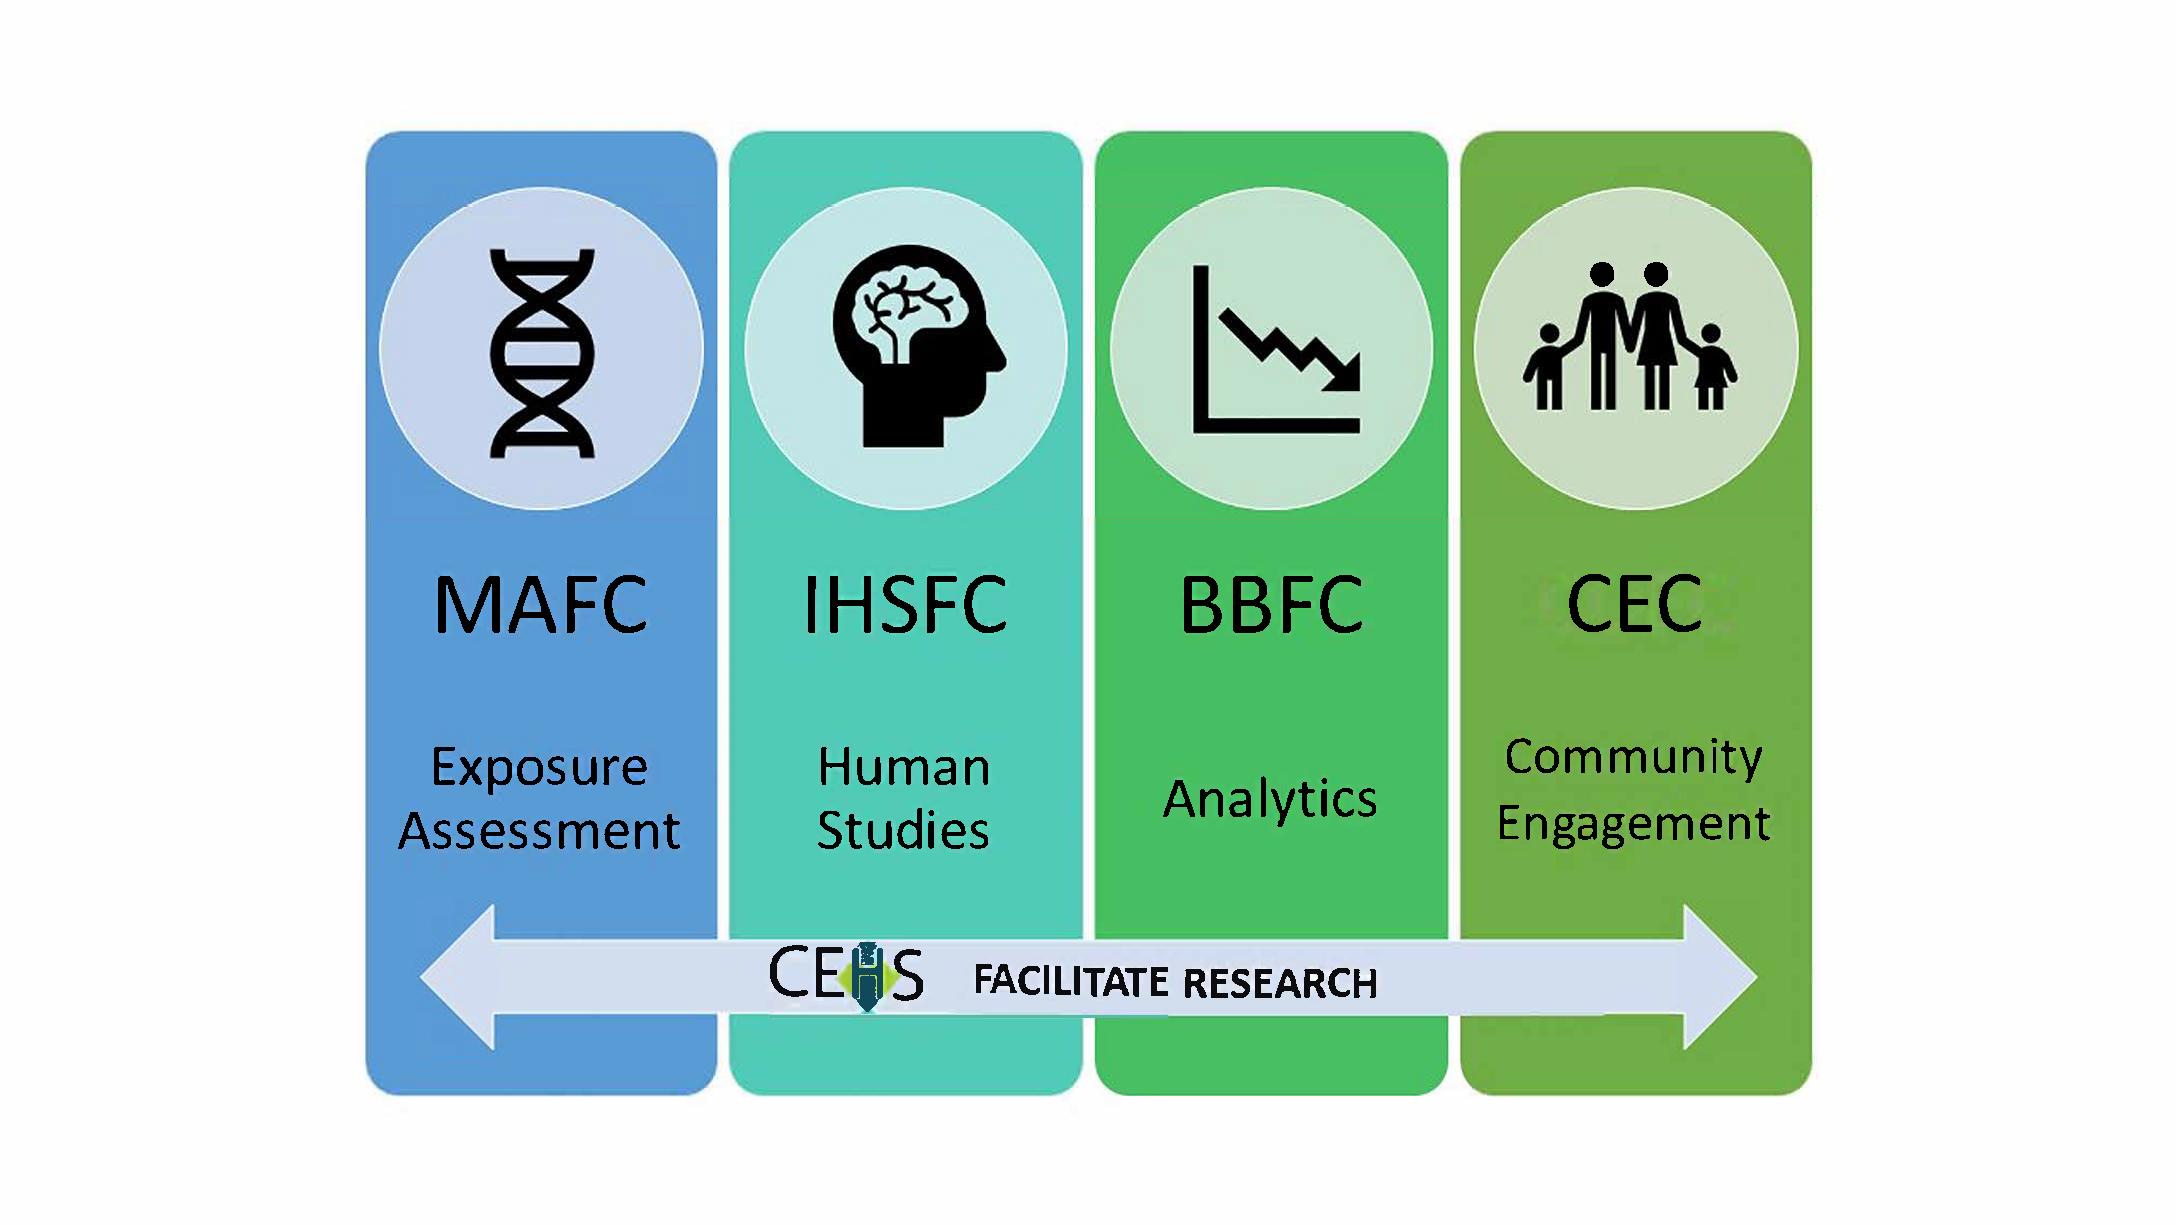 CEHS_Facilitate_Research